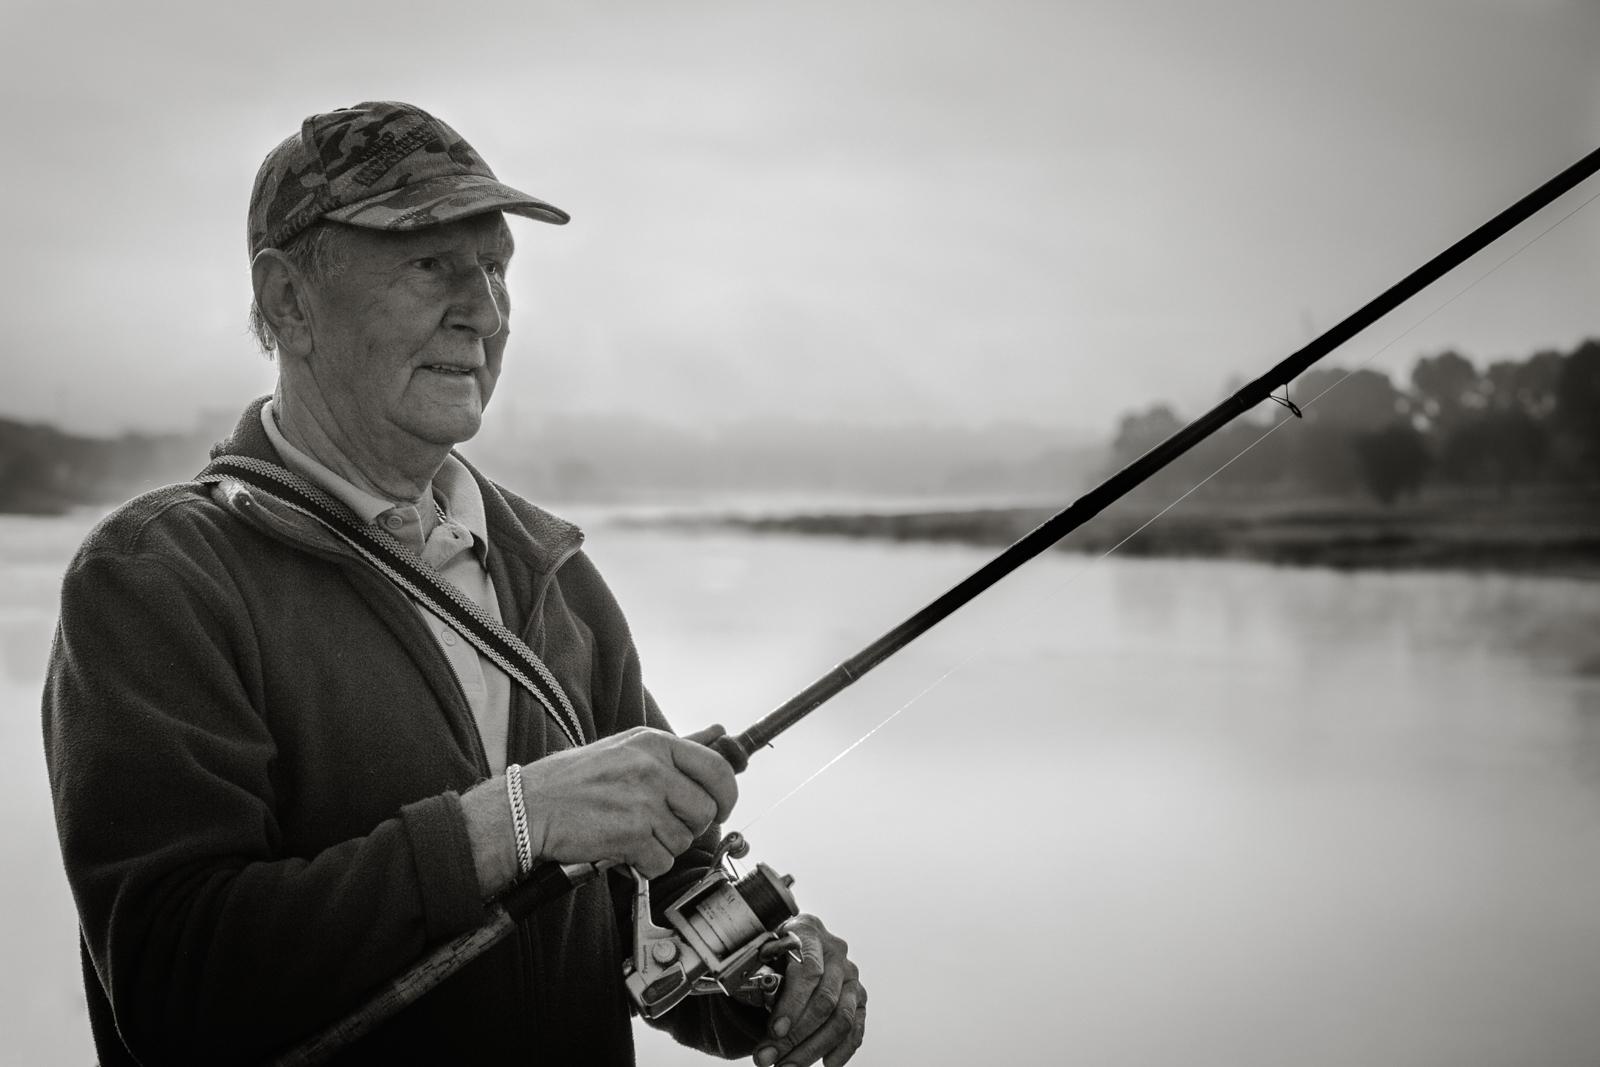 Nr.29. Česlovas, kuris norėjo portreto su žuvimi, bet visiškai nekibo.